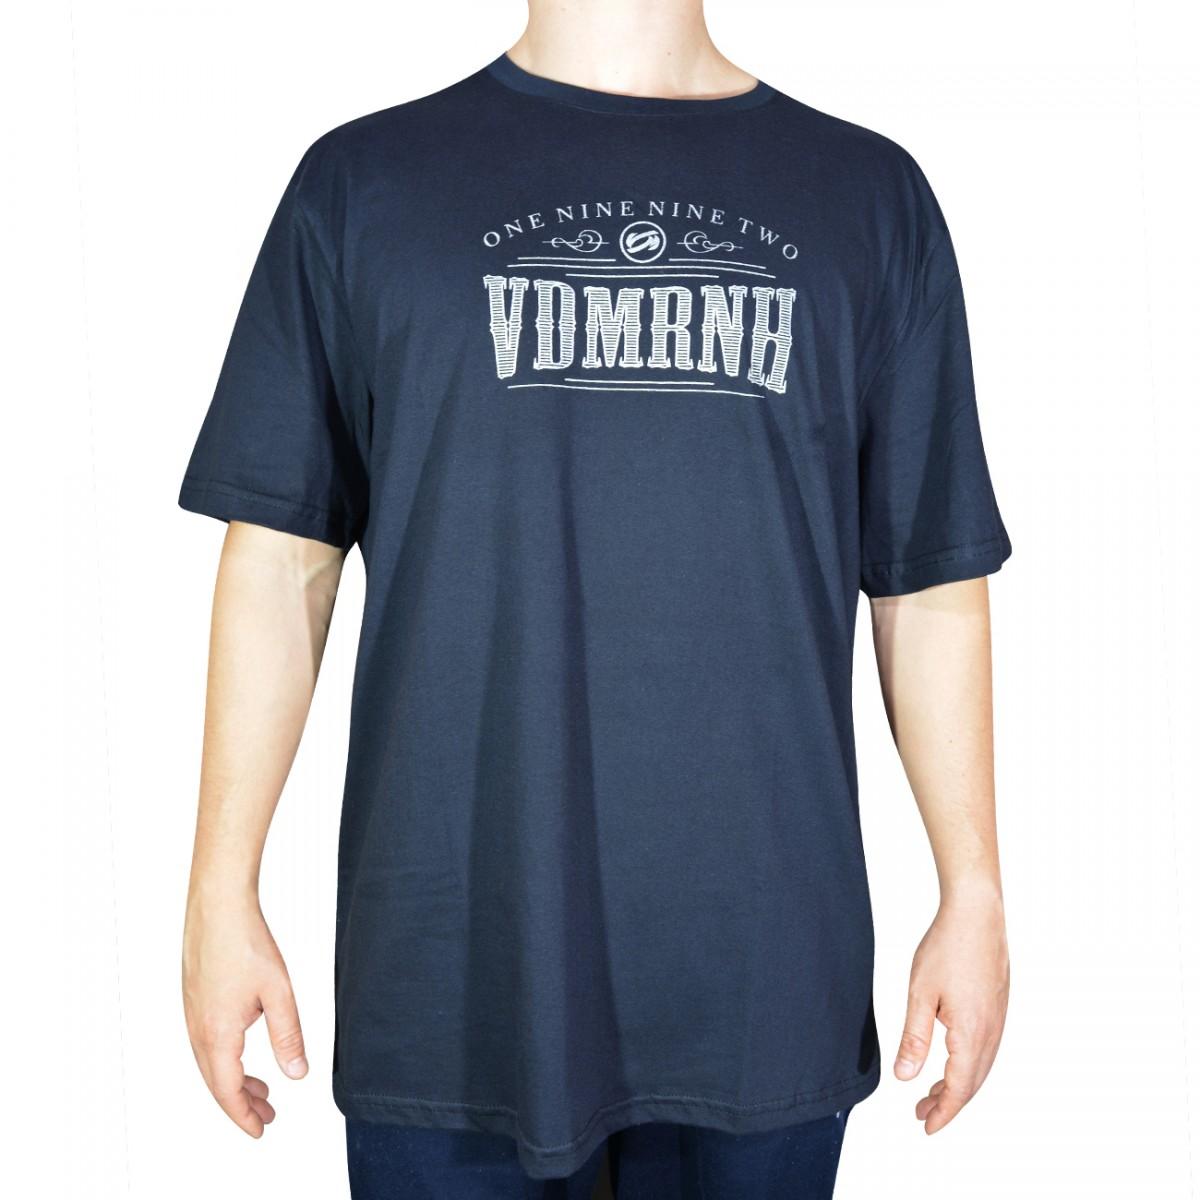 Camiseta Vida Marinha 2166 CMT2166 - Preto - Chuteira Nike 60c5ce8c31dae